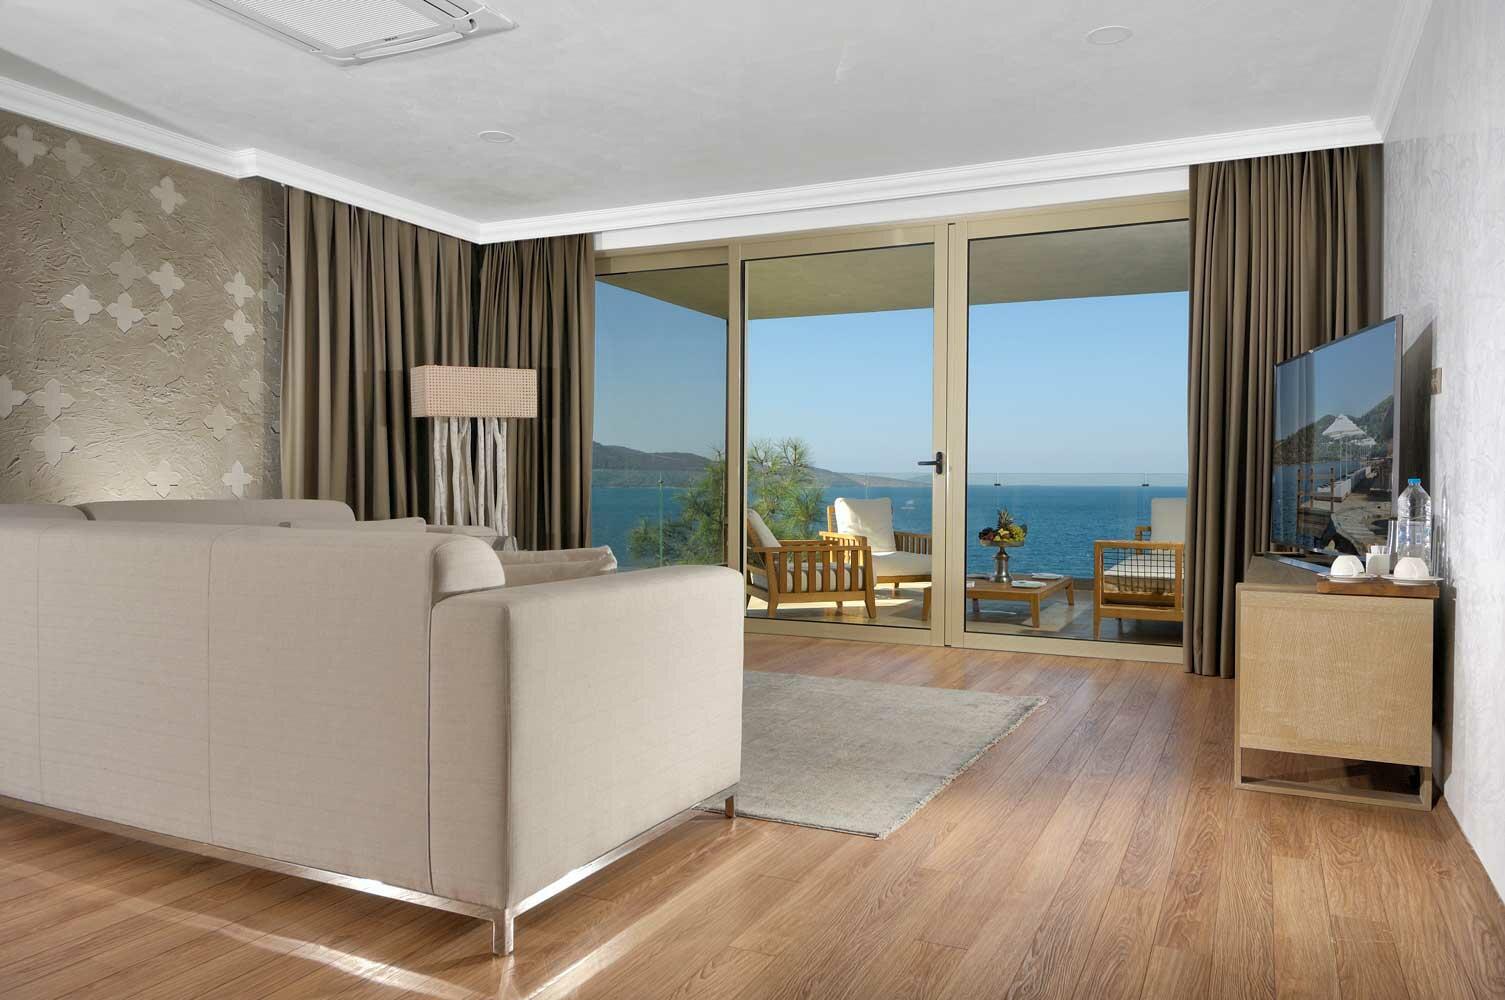 Grand Suite at Sarpedor Boutique Beach Hotel in Bodrum, Turkey